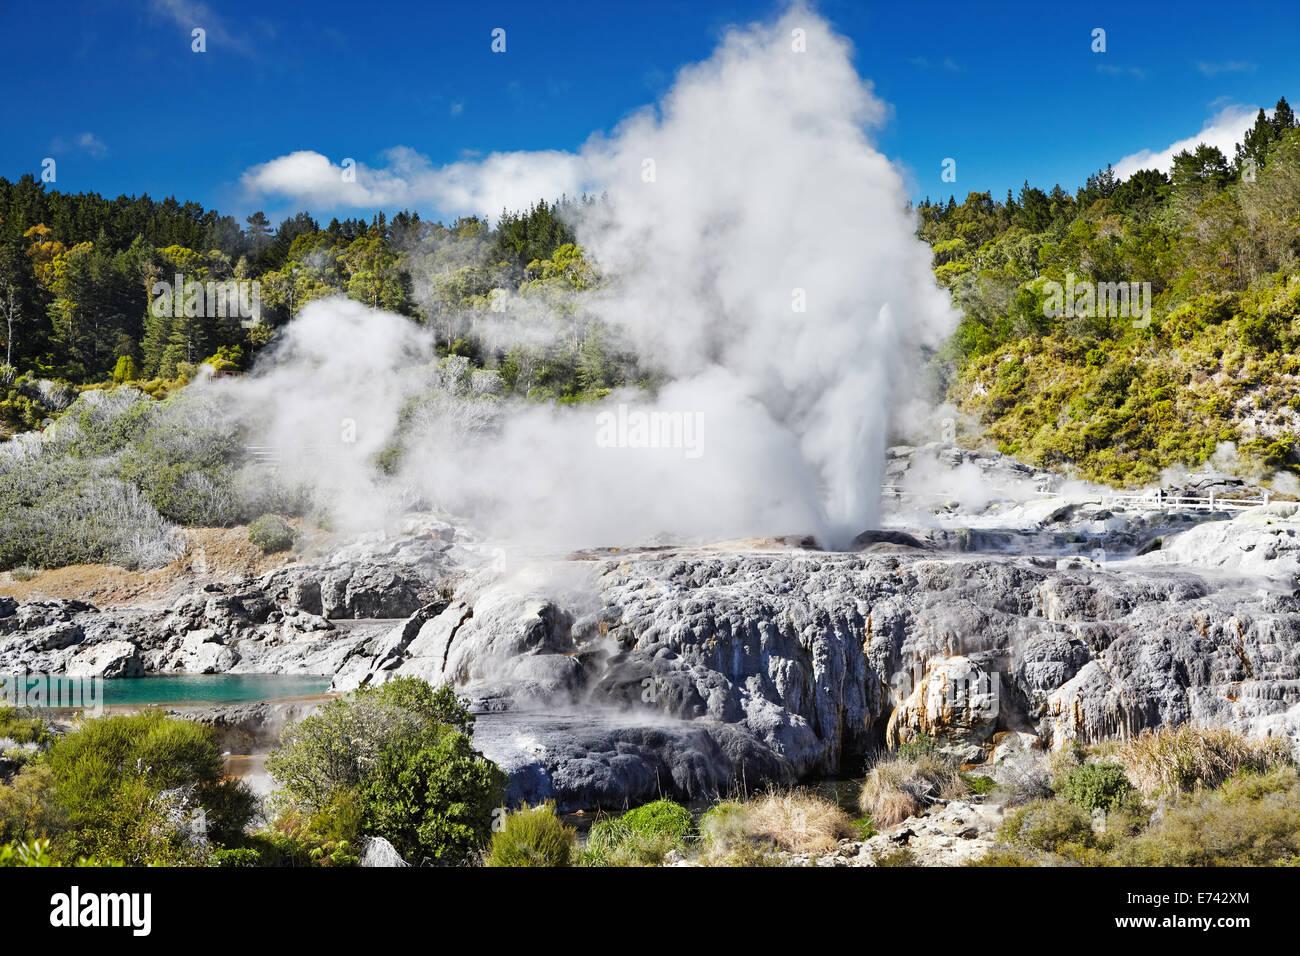 Pohutu Geyser, Whakarewarewa Thermal Valley, Rotorua, New Zealand - Stock Image